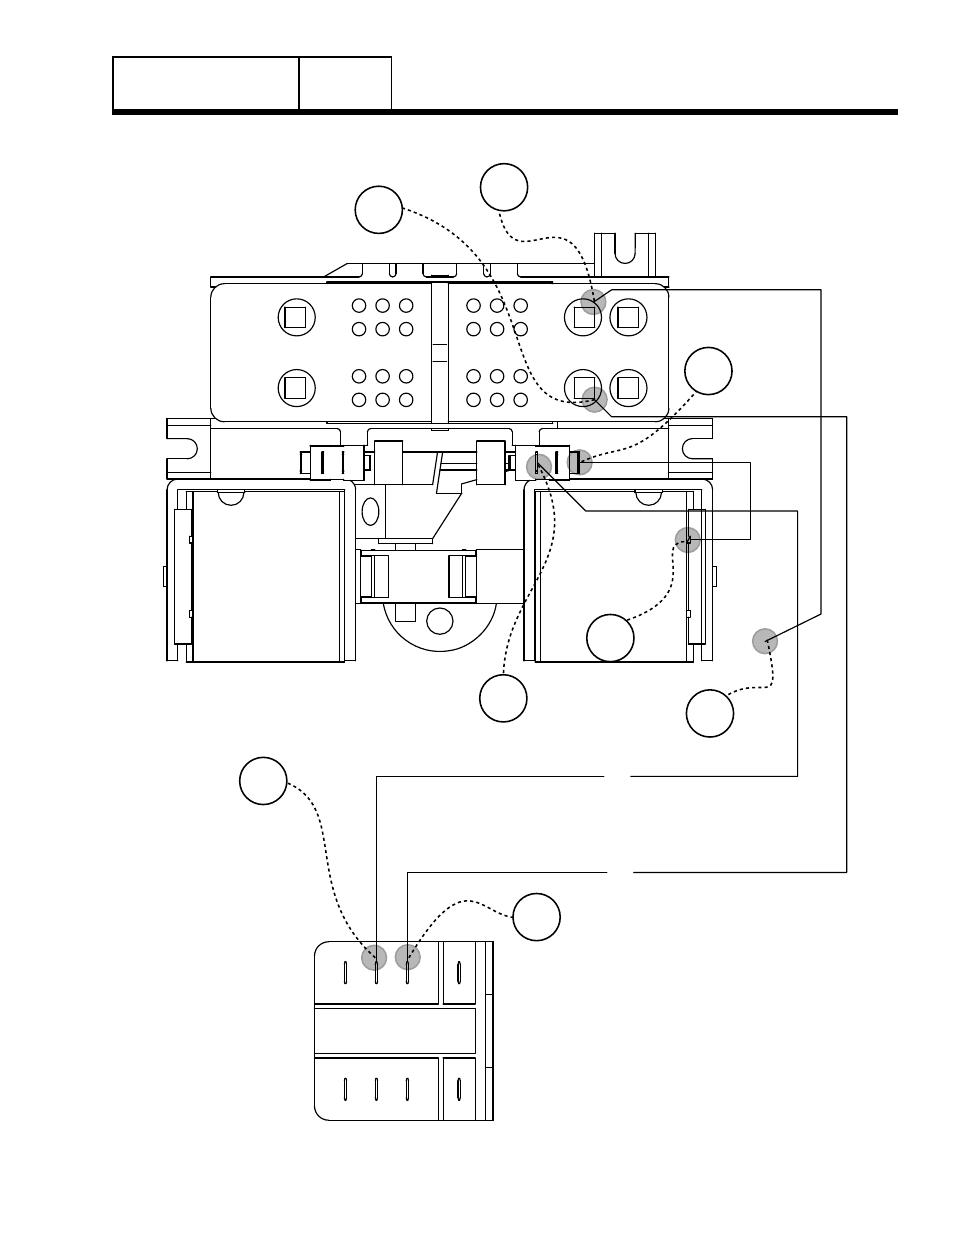 mi t m wiring diagram